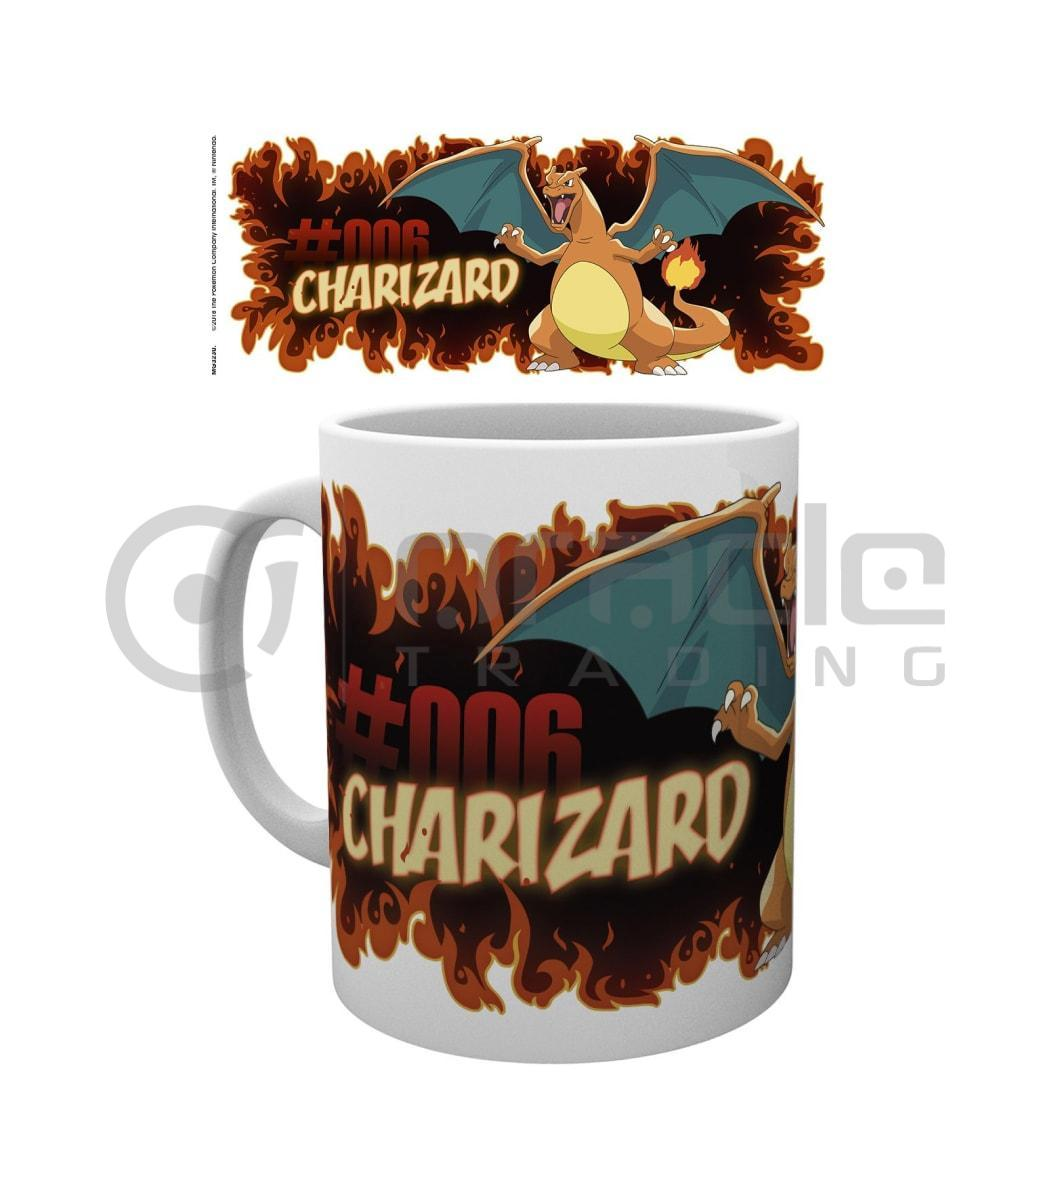 Pokémon Mug - Charizard Fire